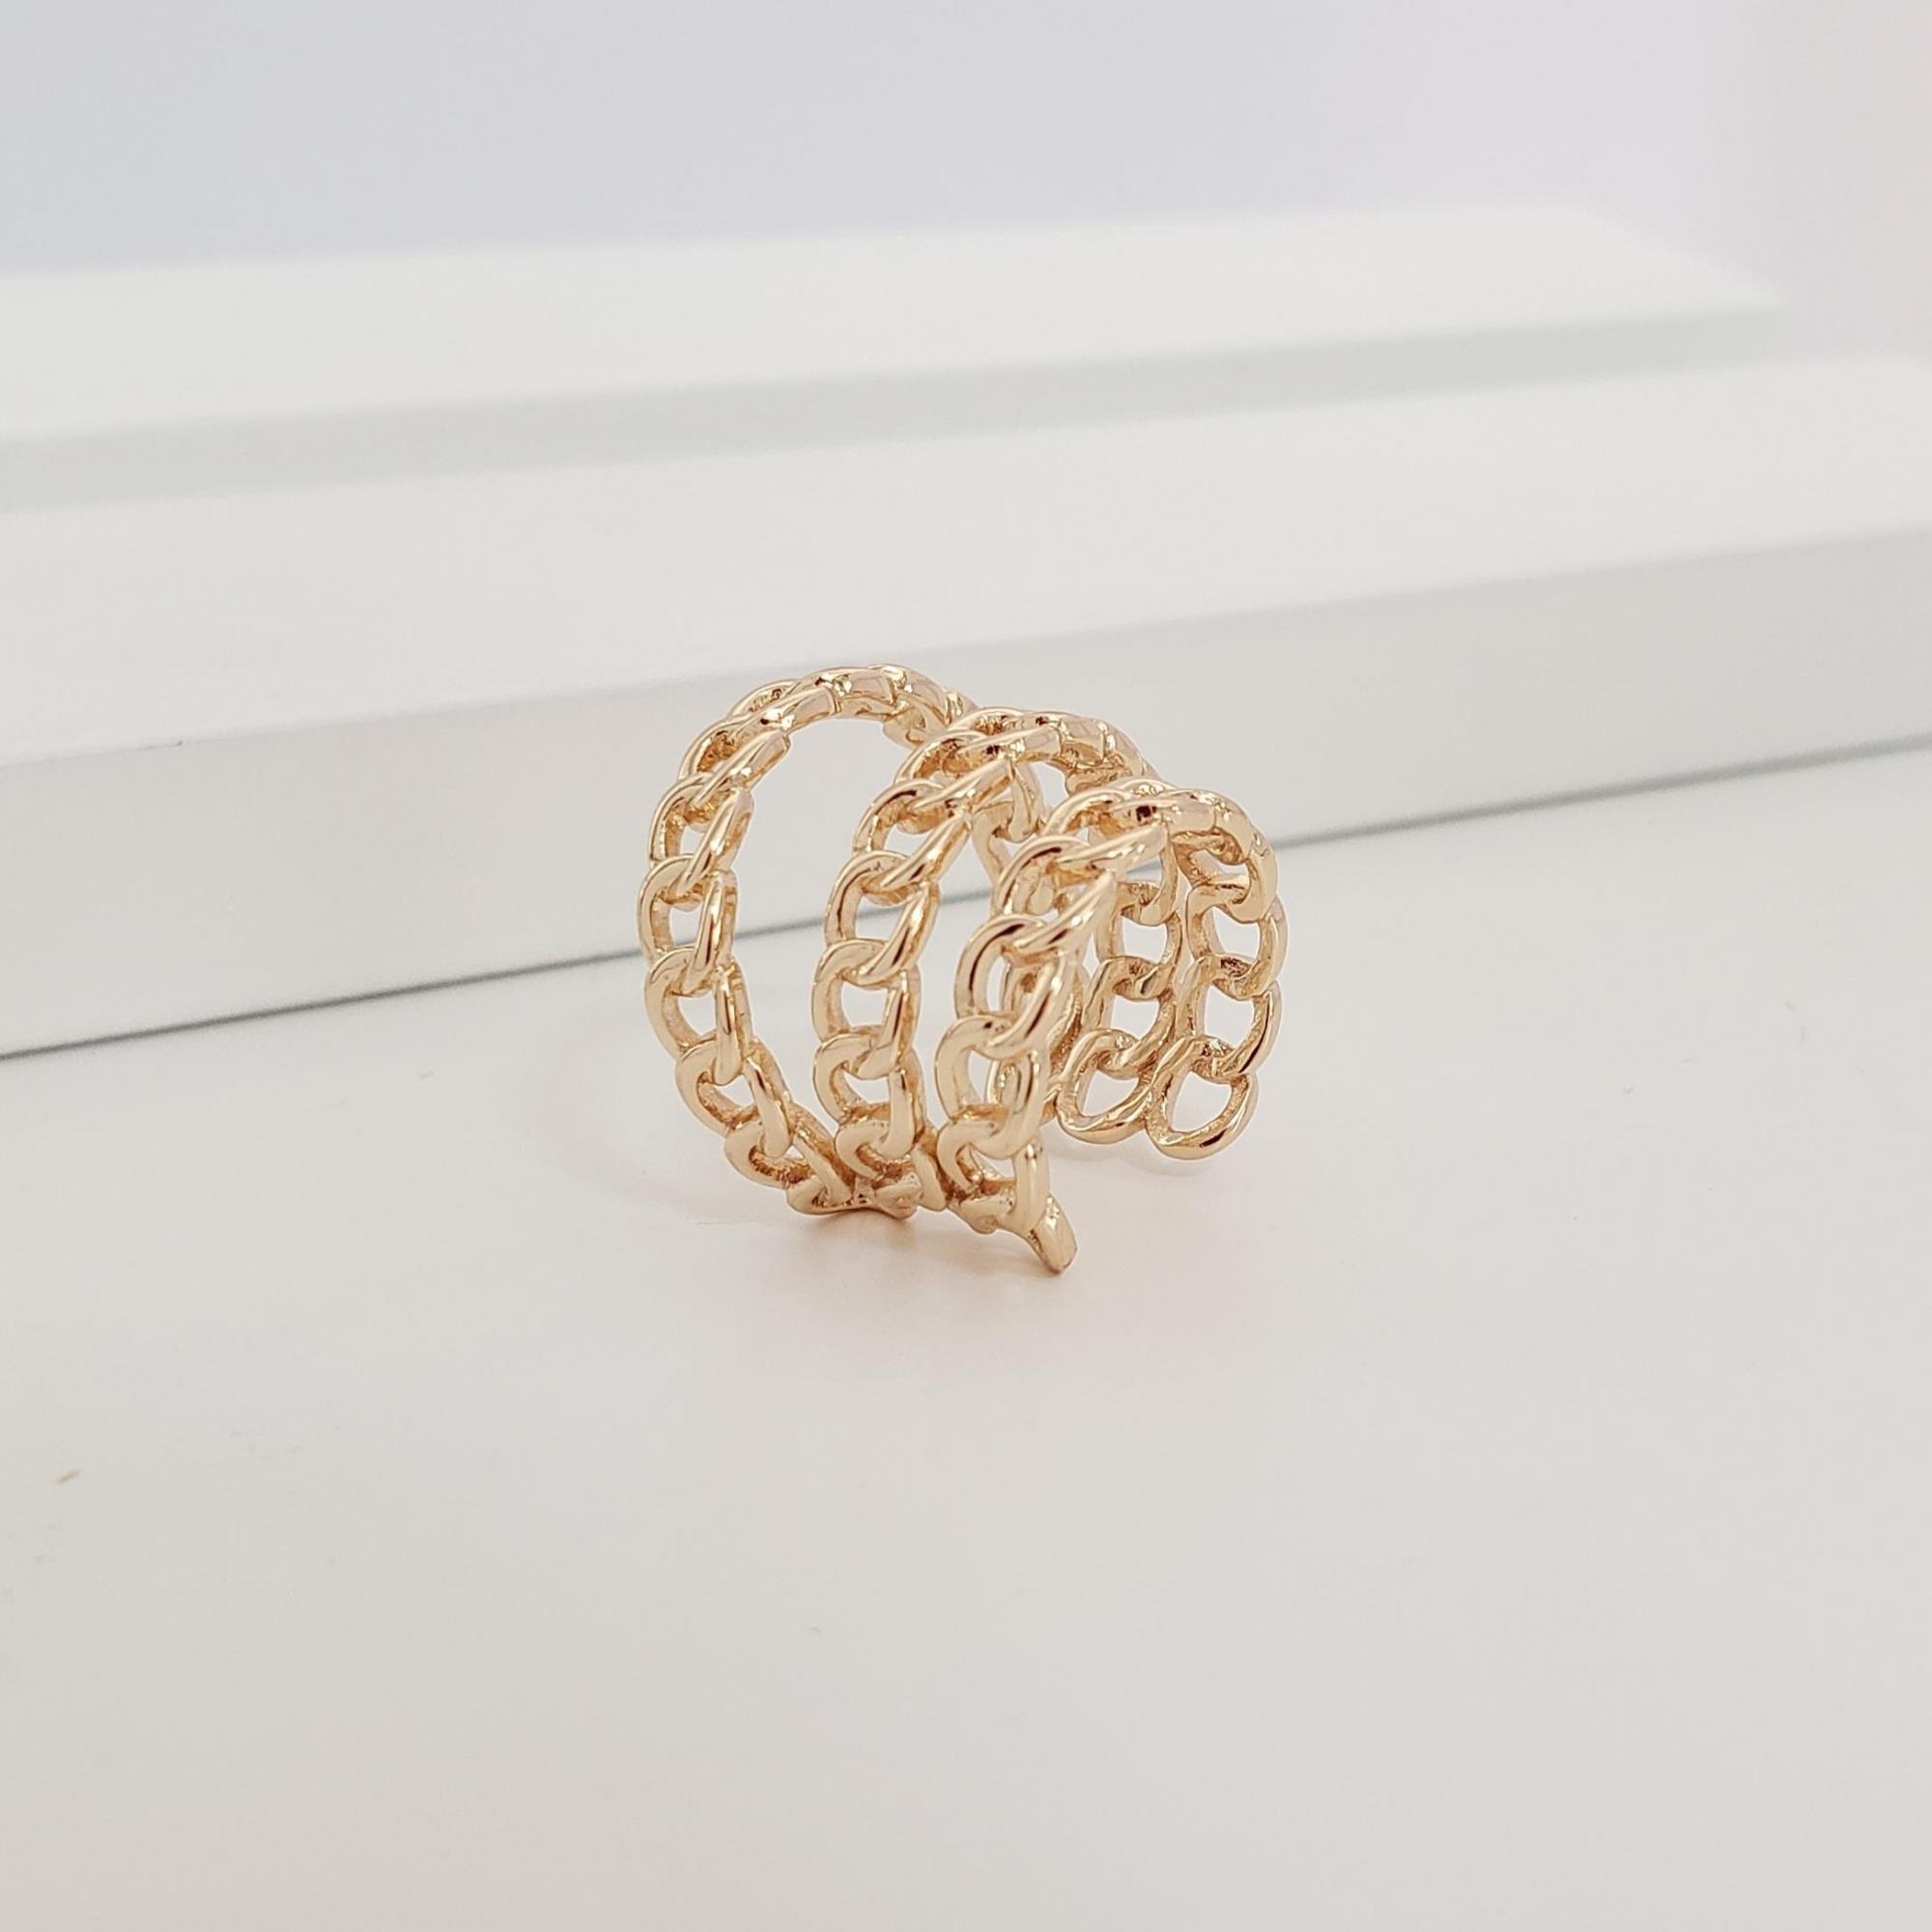 Piercing Filetes Espaçados Elo Cartier no Banho Ouro 18k Semijoia